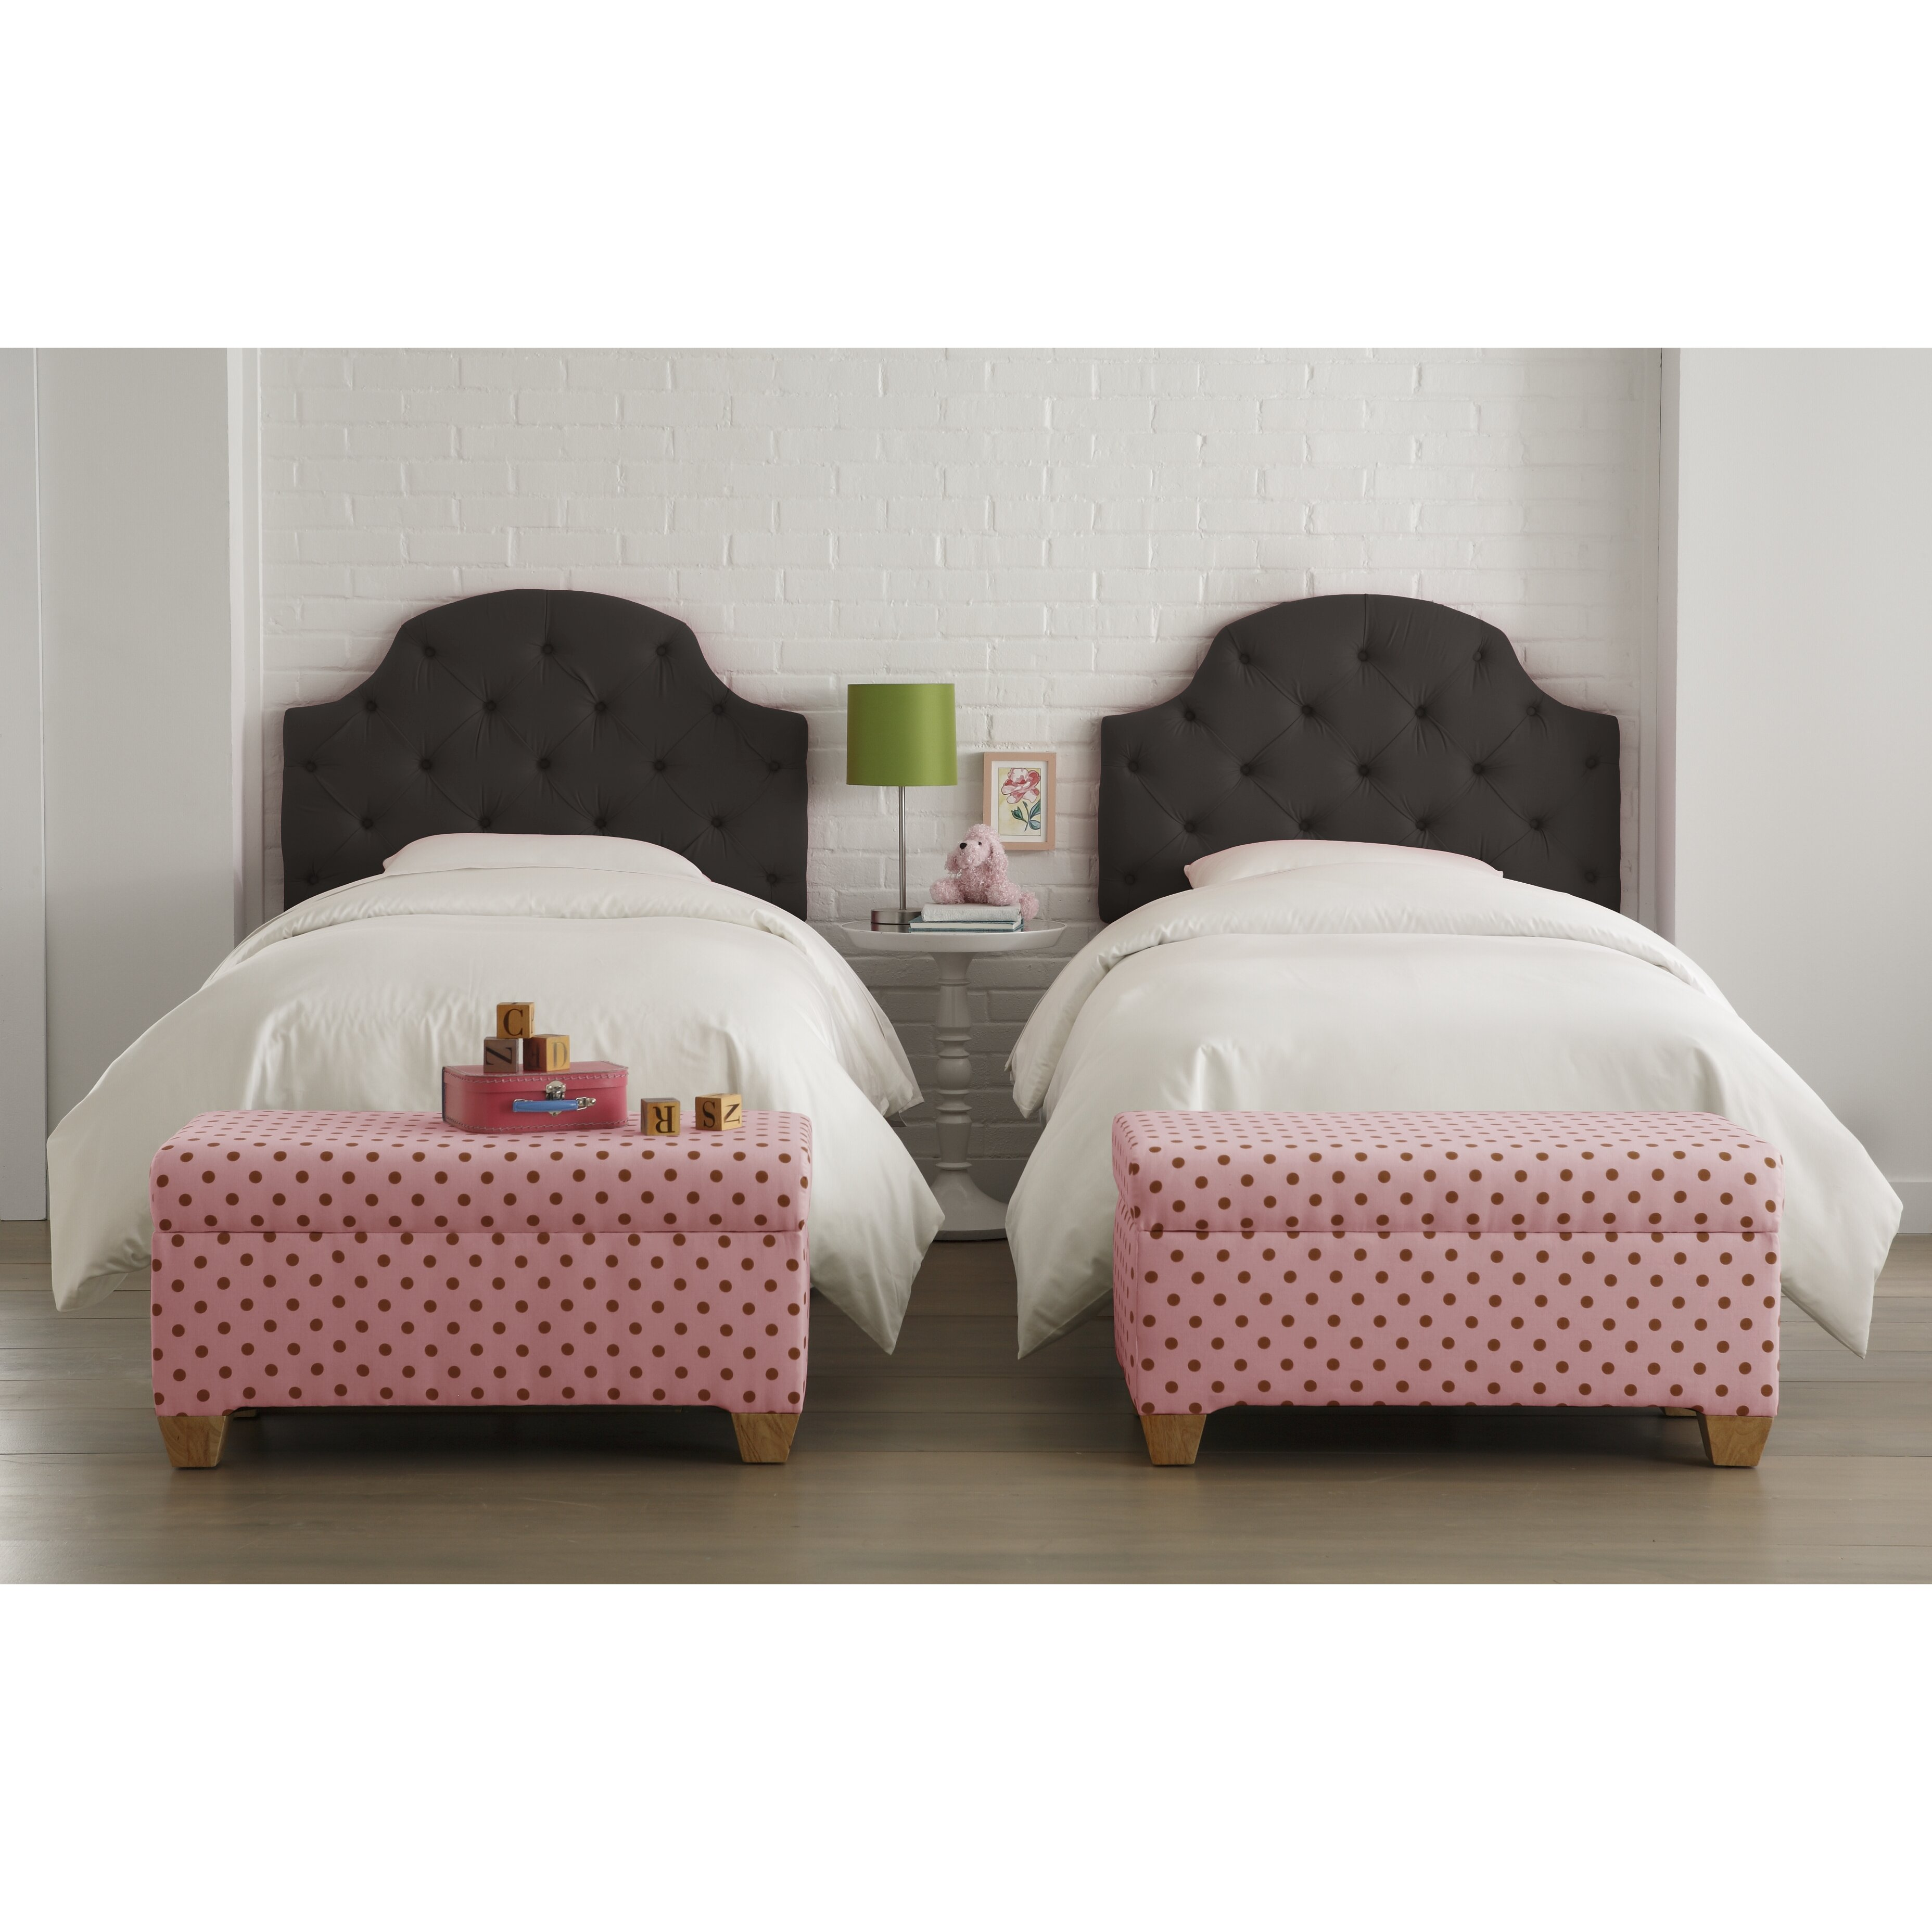 Skyline Bedroom Furniture Skyline Furniture Tufted Cotton Upholstered Headboard Reviews